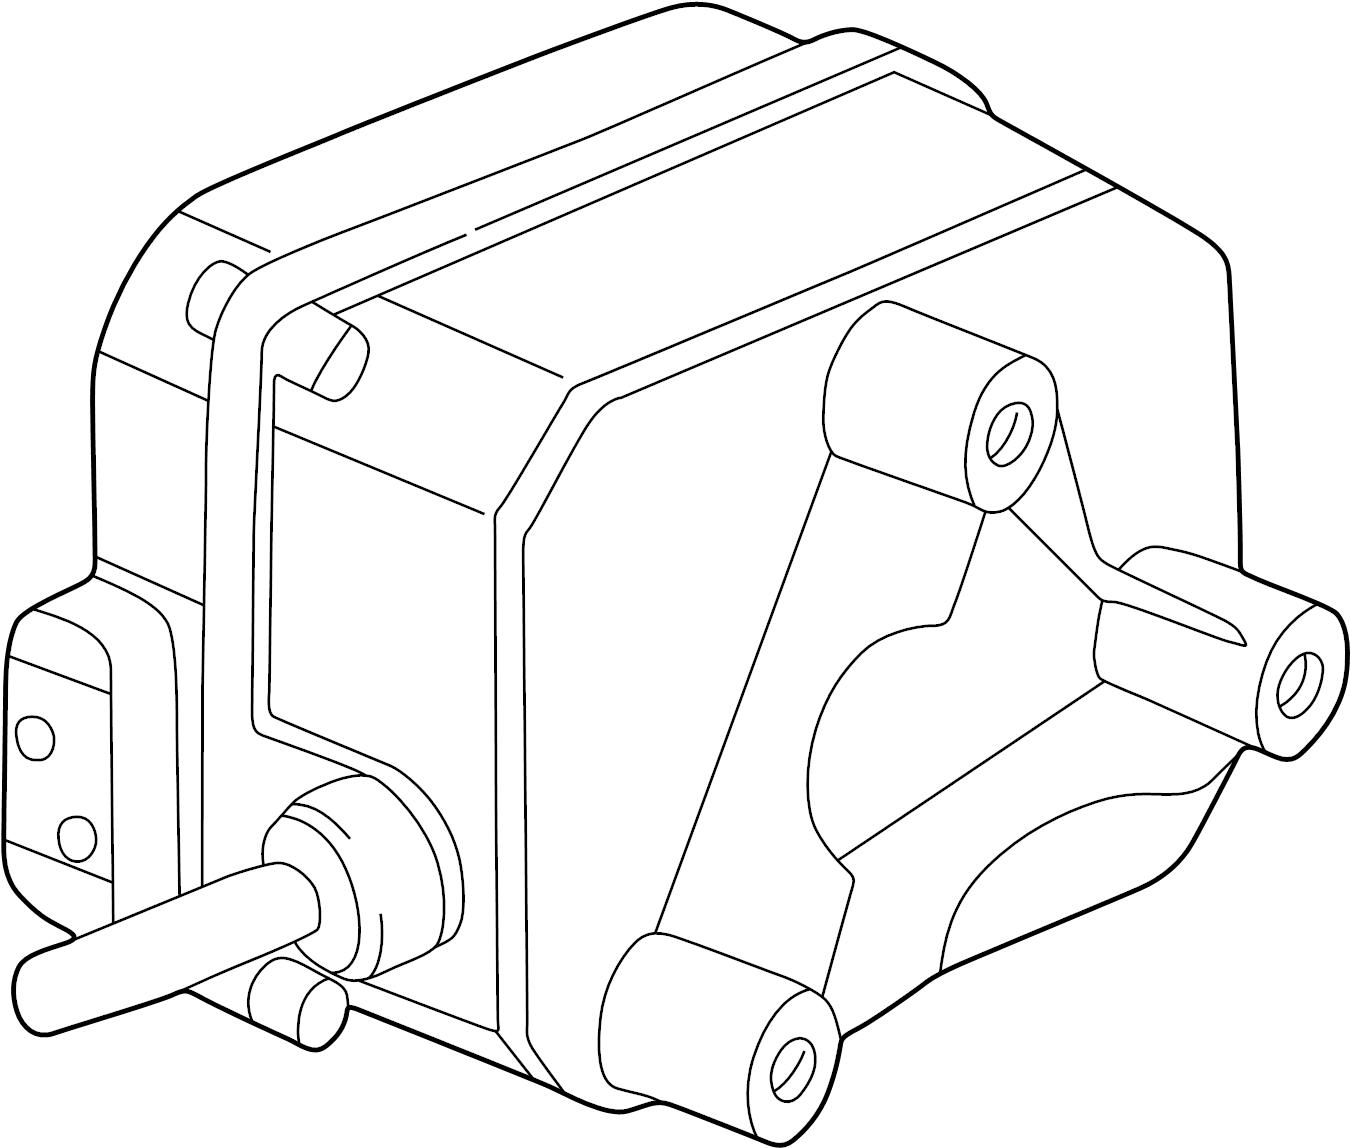 Siemens Wiring Diagram as well 817804 Diy Oil Level Sender Sensor Fixed as well Porsche Engine Cooling Diagram additionally Belos Rabiscos furthermore Belos Rabiscos. on porsche 996 turbo